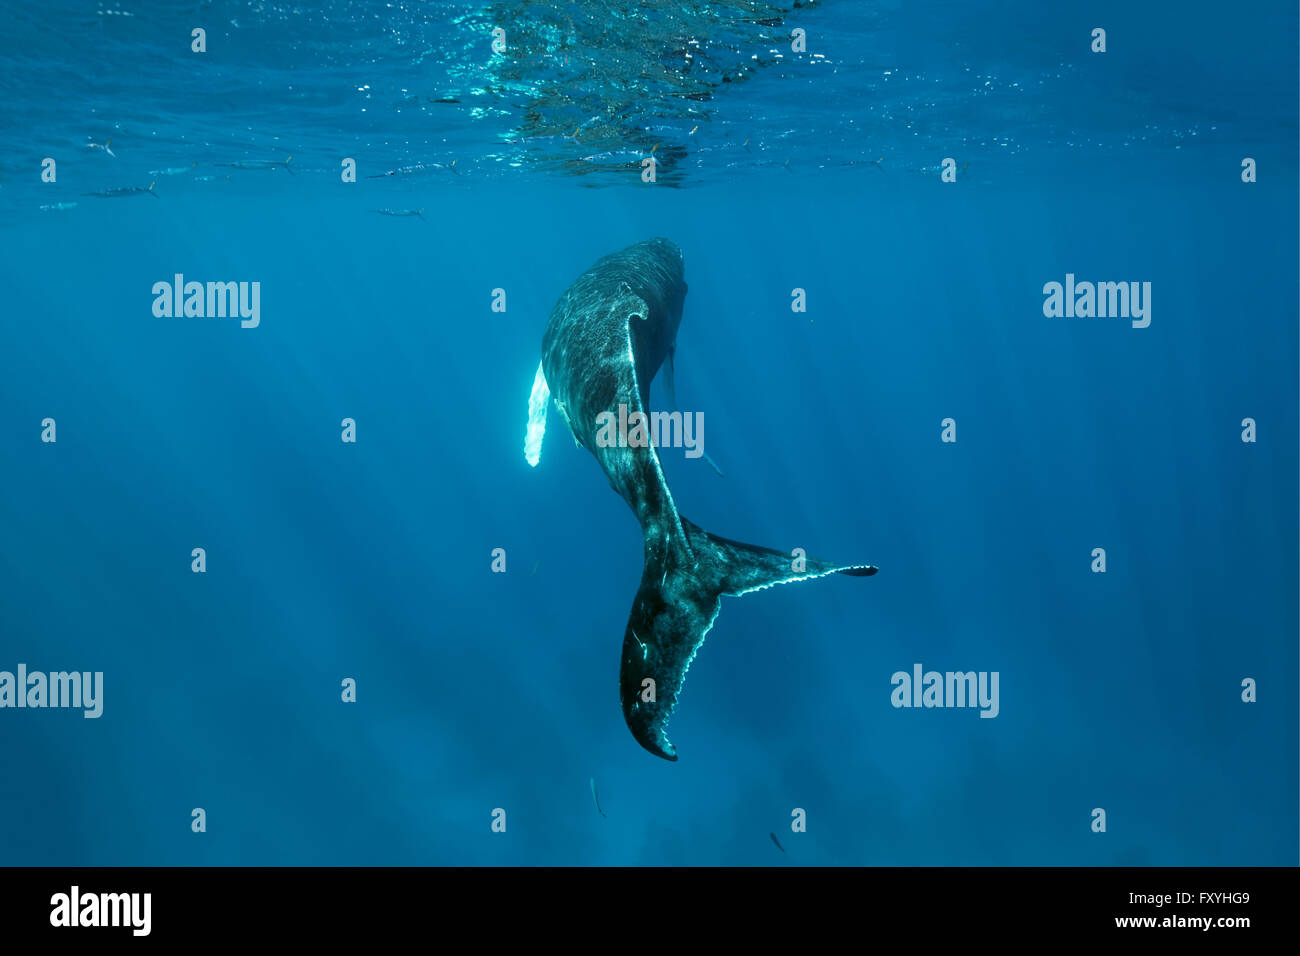 Humpback whale (Megaptera novaeangliae) over coral reef, Silver Bank, Silver and Navidad Bank Sanctuary, Atlantic - Stock Image